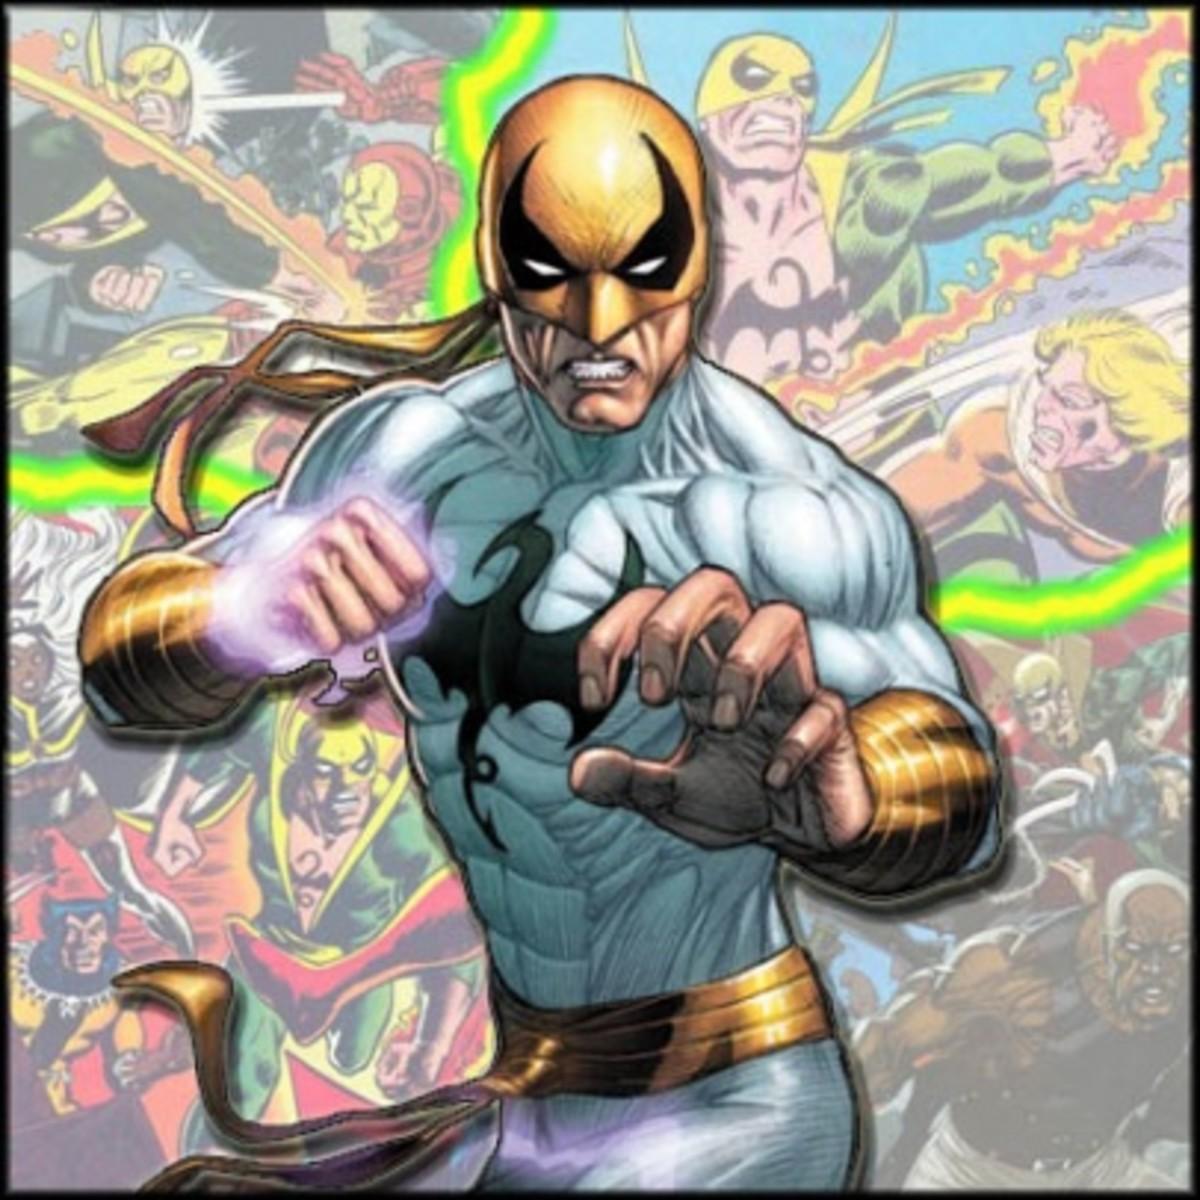 Marvel Comics' Iron Fist.